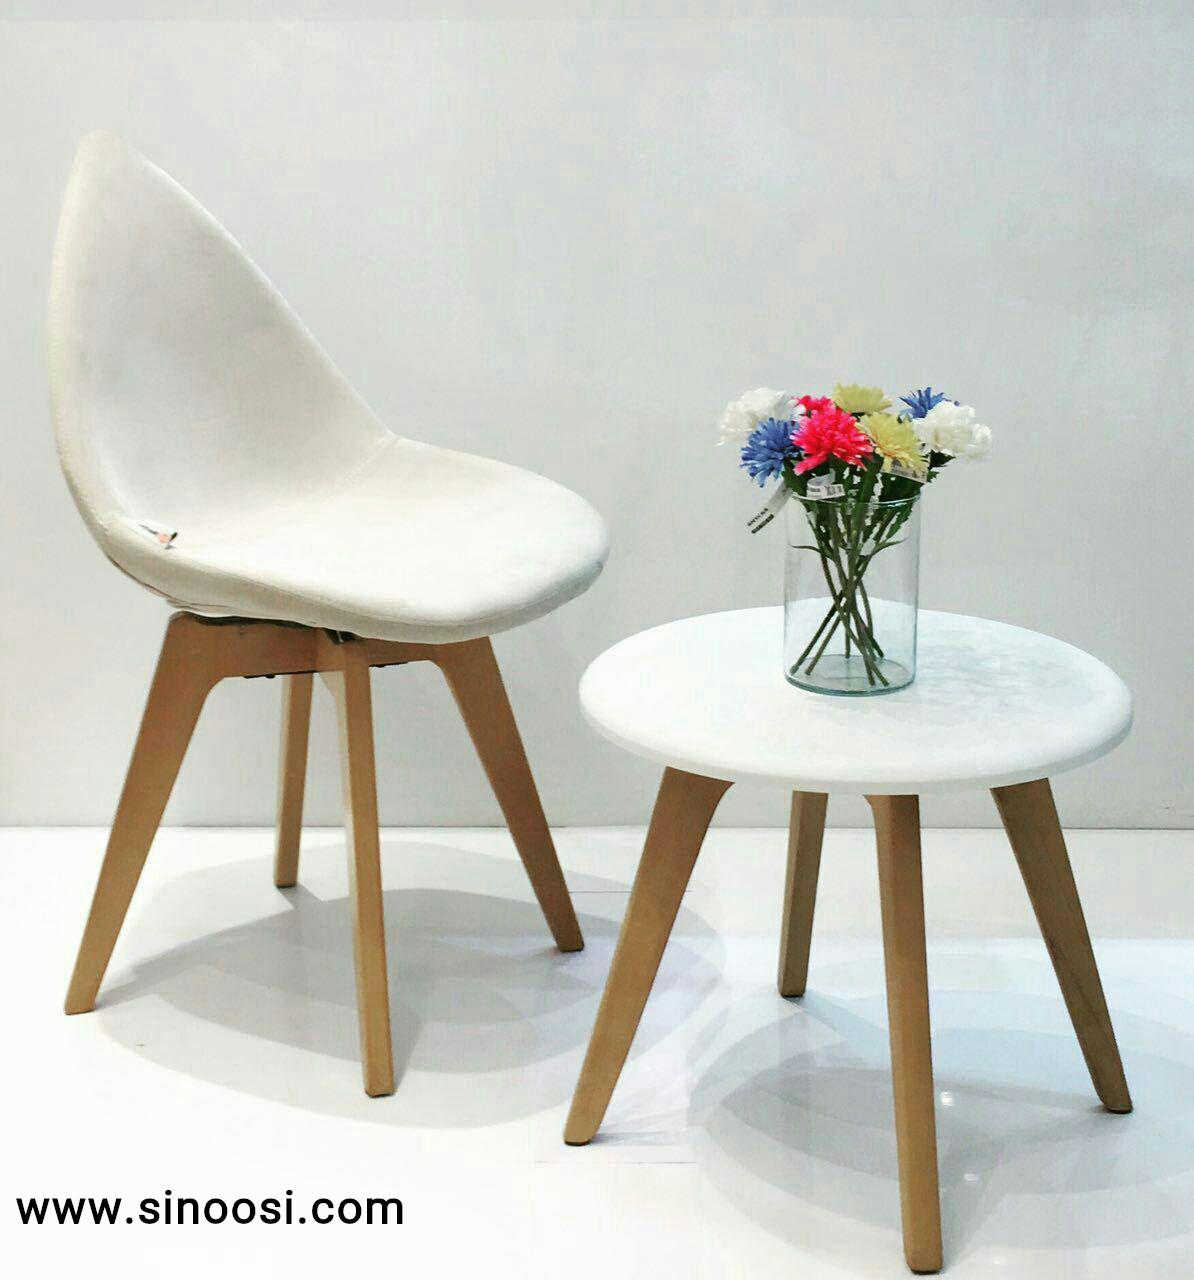 میز عسلی چوبی